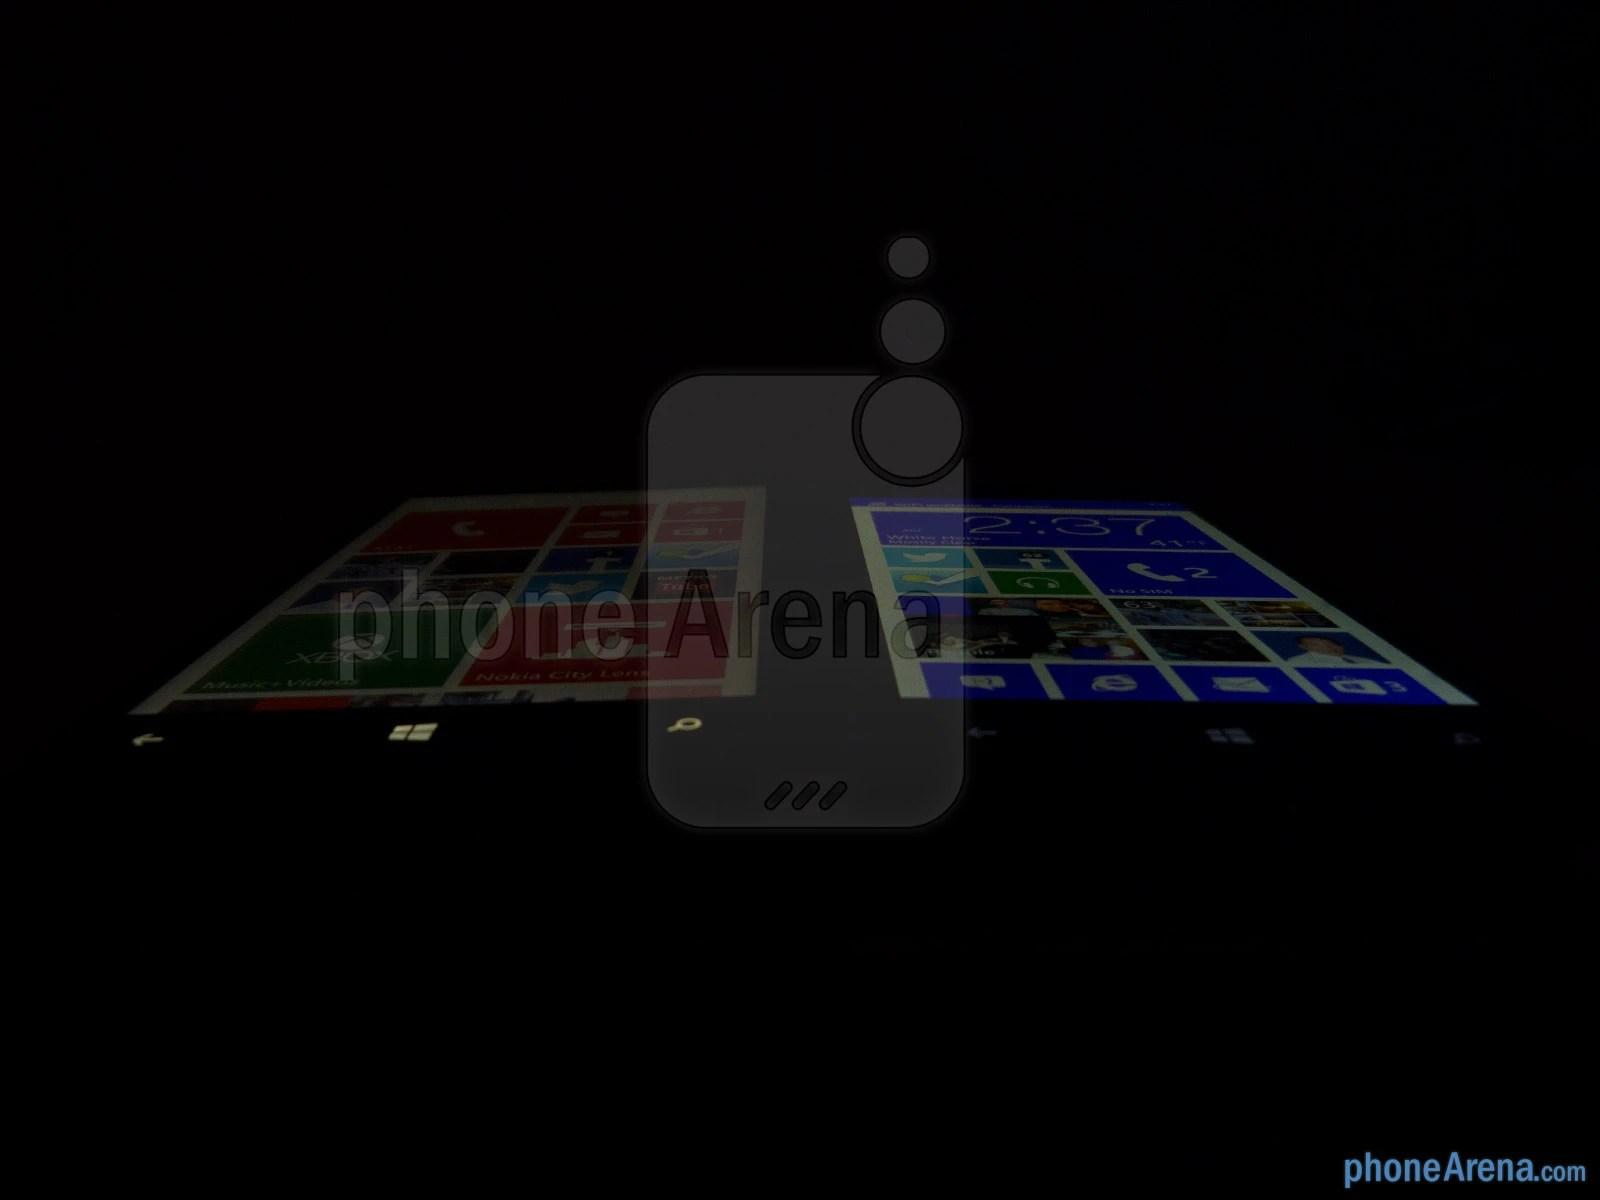 Mobile078 The Greatest Wordpresscom Site In All Land Nokia Lumia 720 Resmi Cyan 12